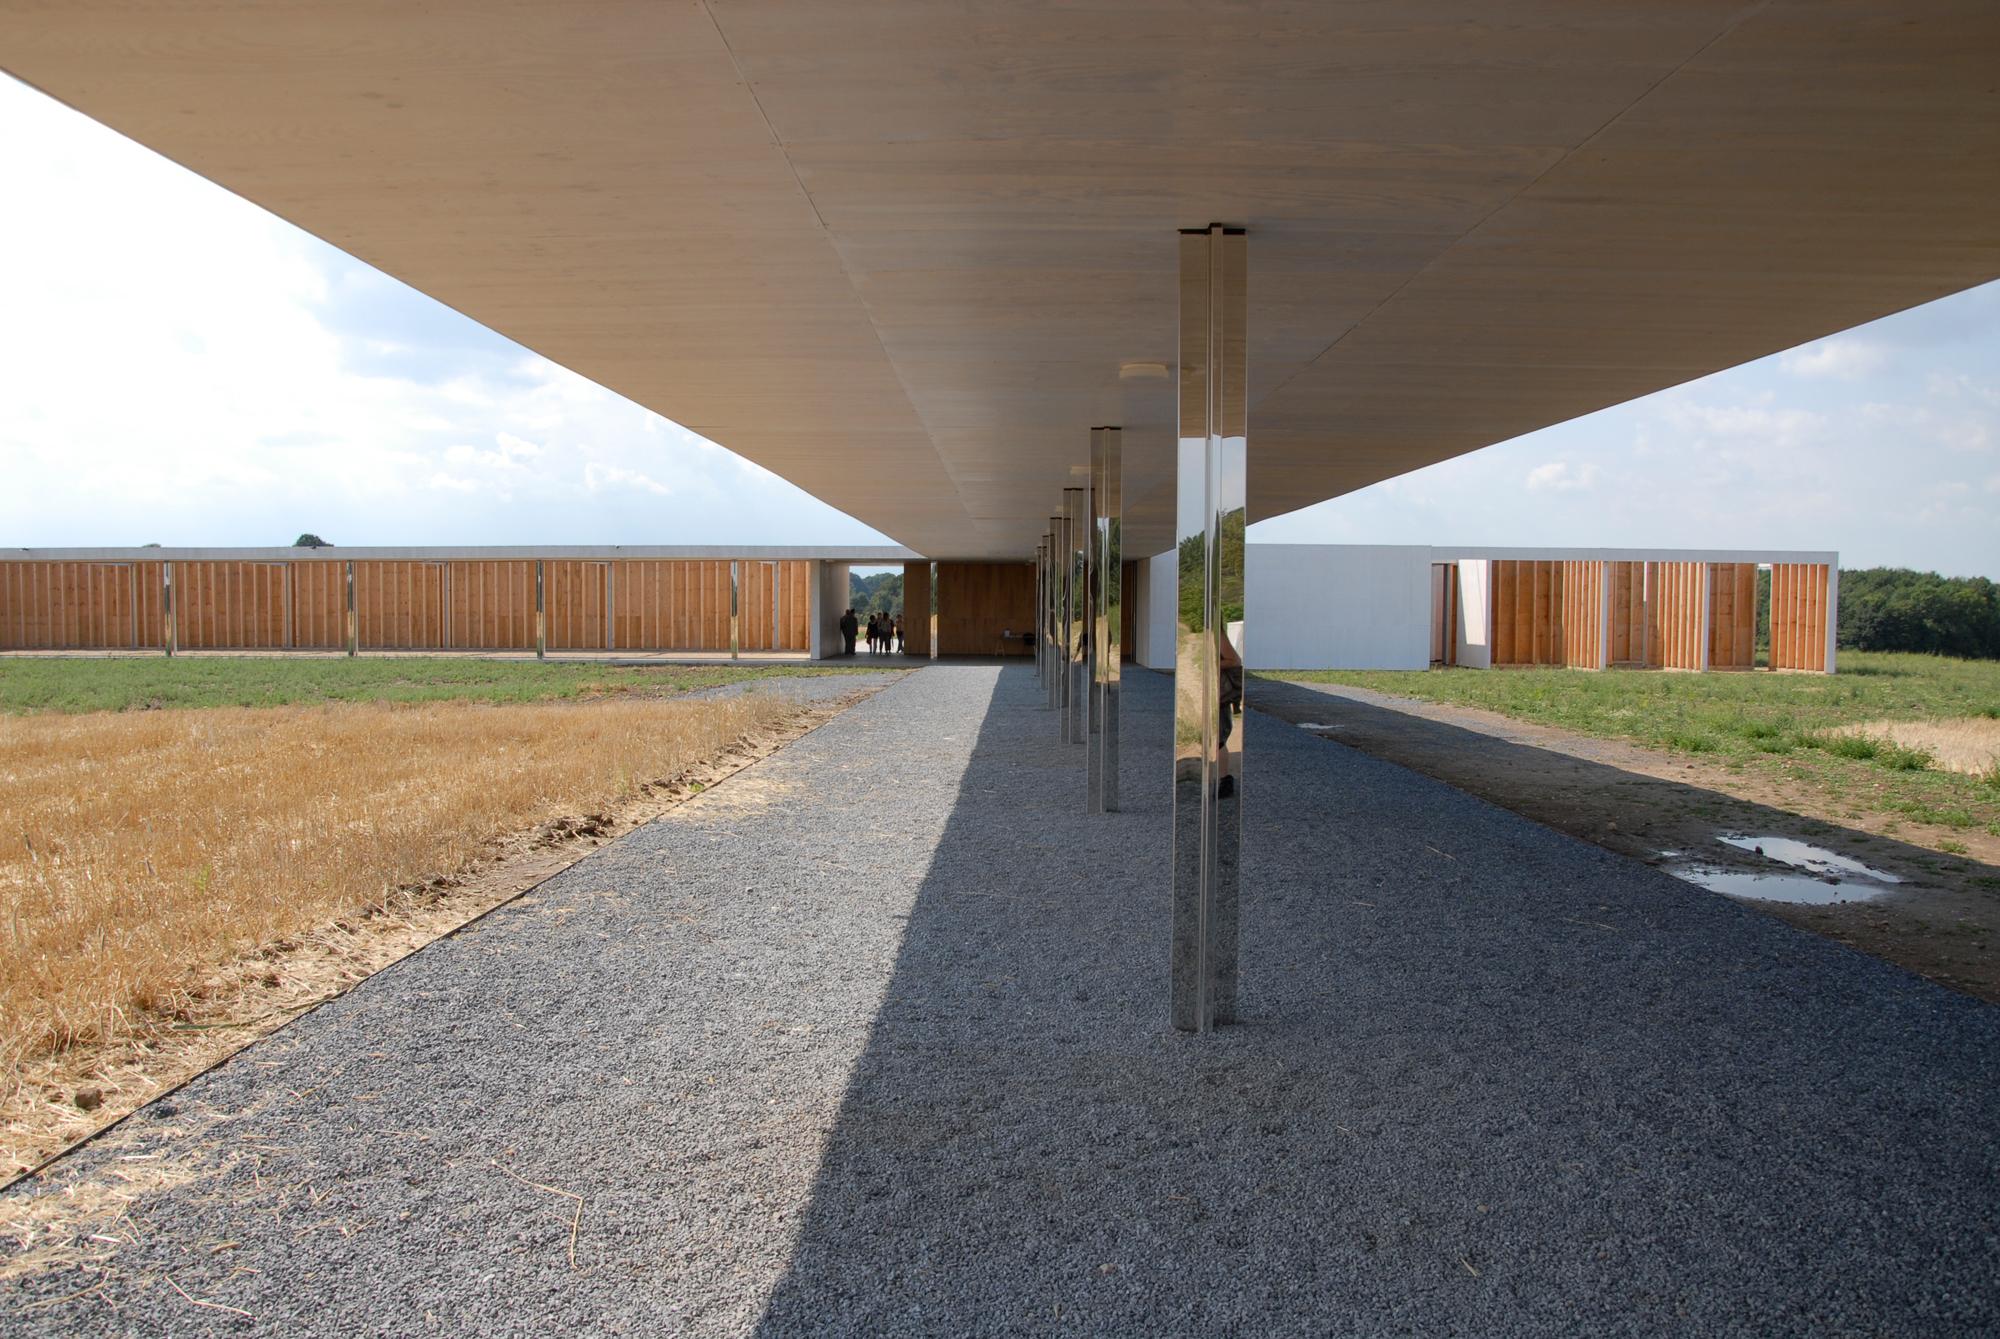 sabine remy miriskum kunst und kultur unterwegs mies 1 1 golfclub projekt krefeld. Black Bedroom Furniture Sets. Home Design Ideas